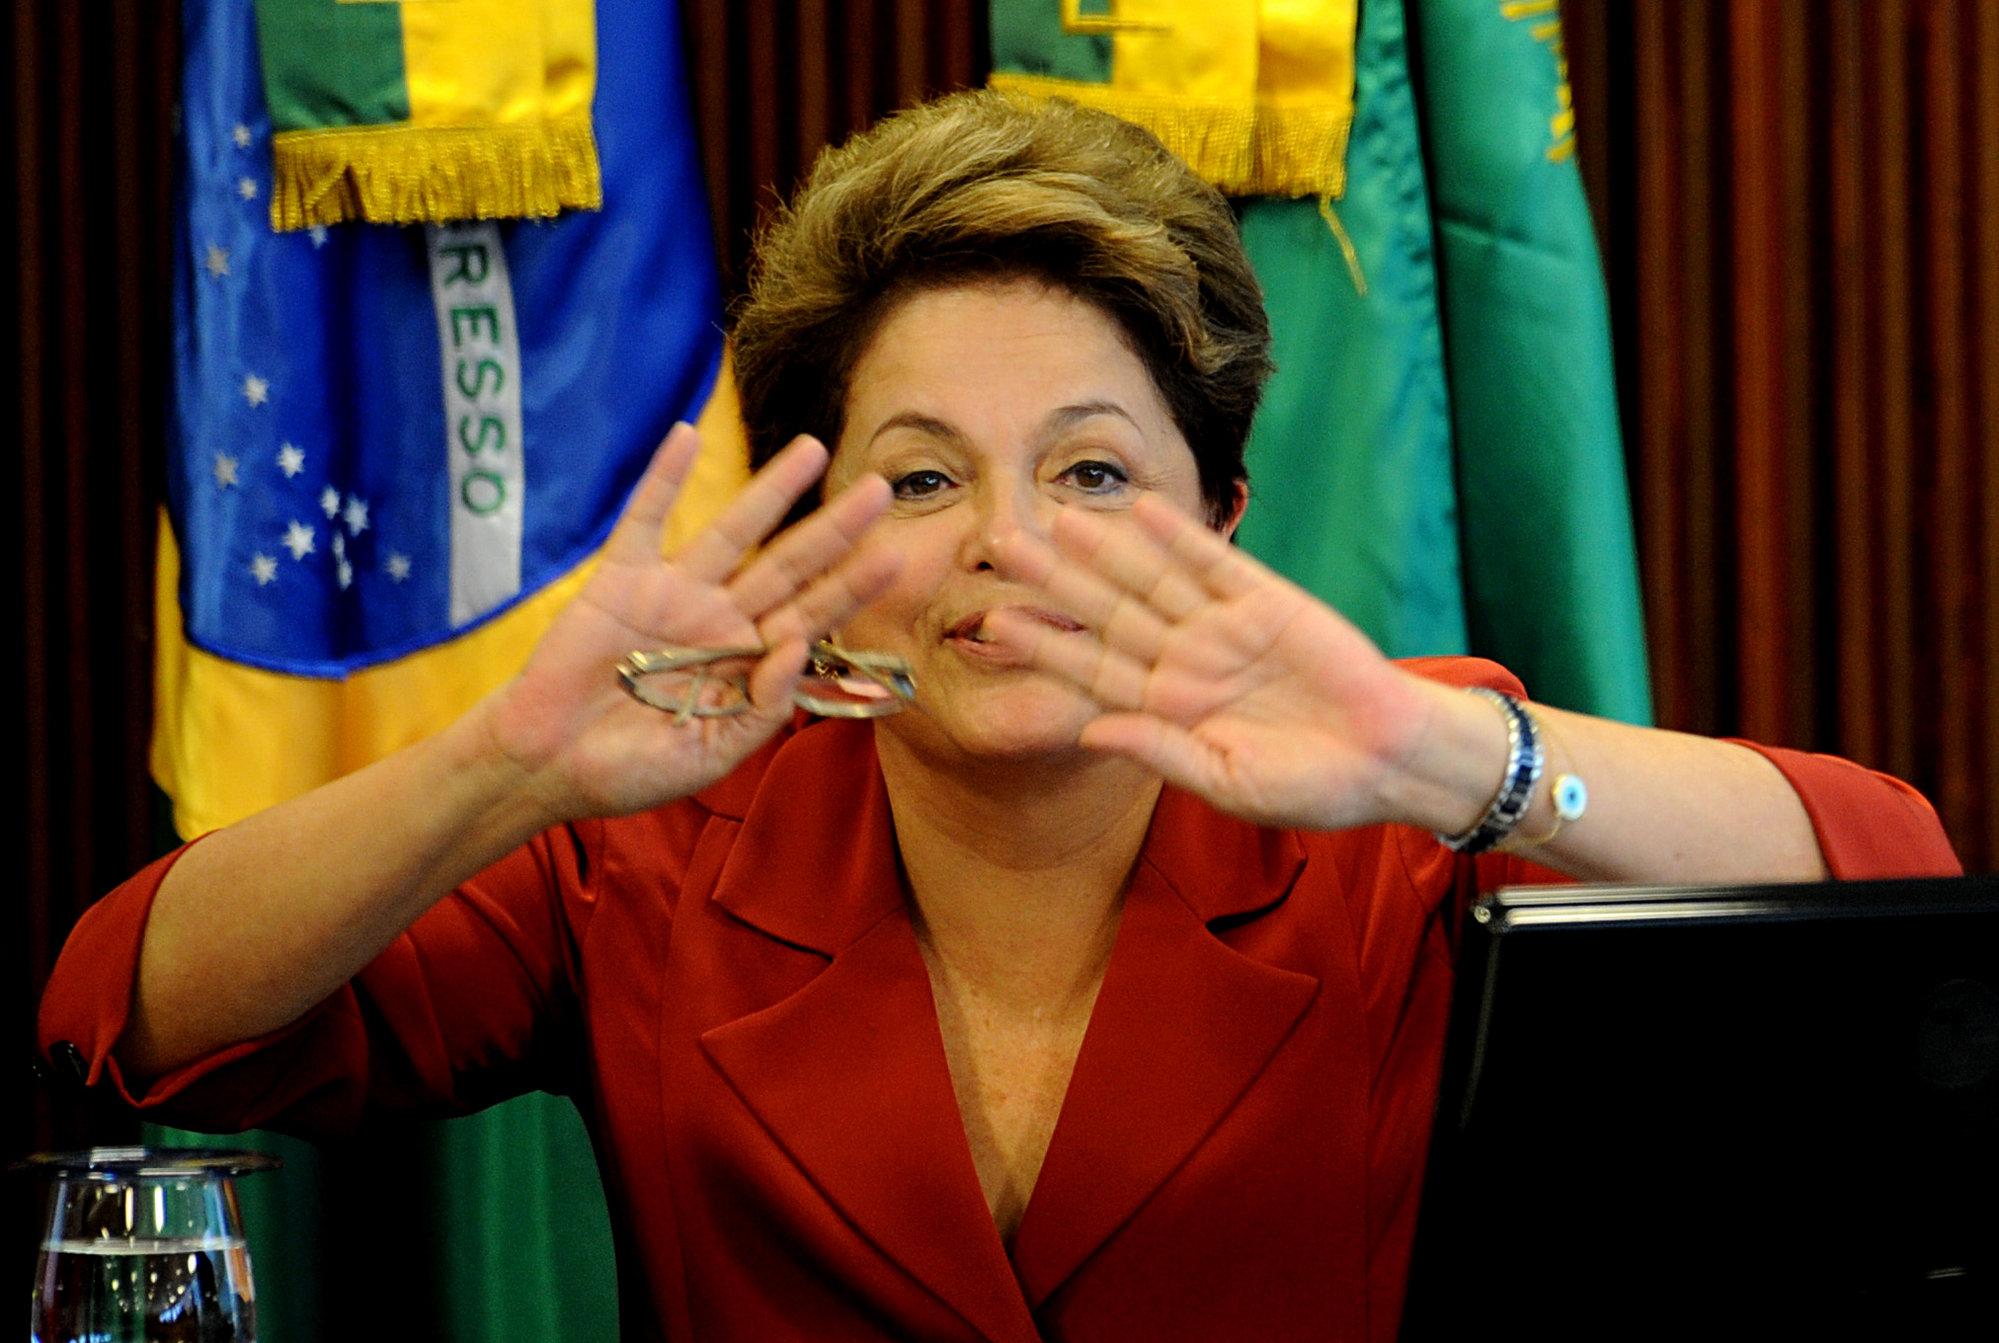 La prensa saca tarjeta roja a Dilma Rousseff